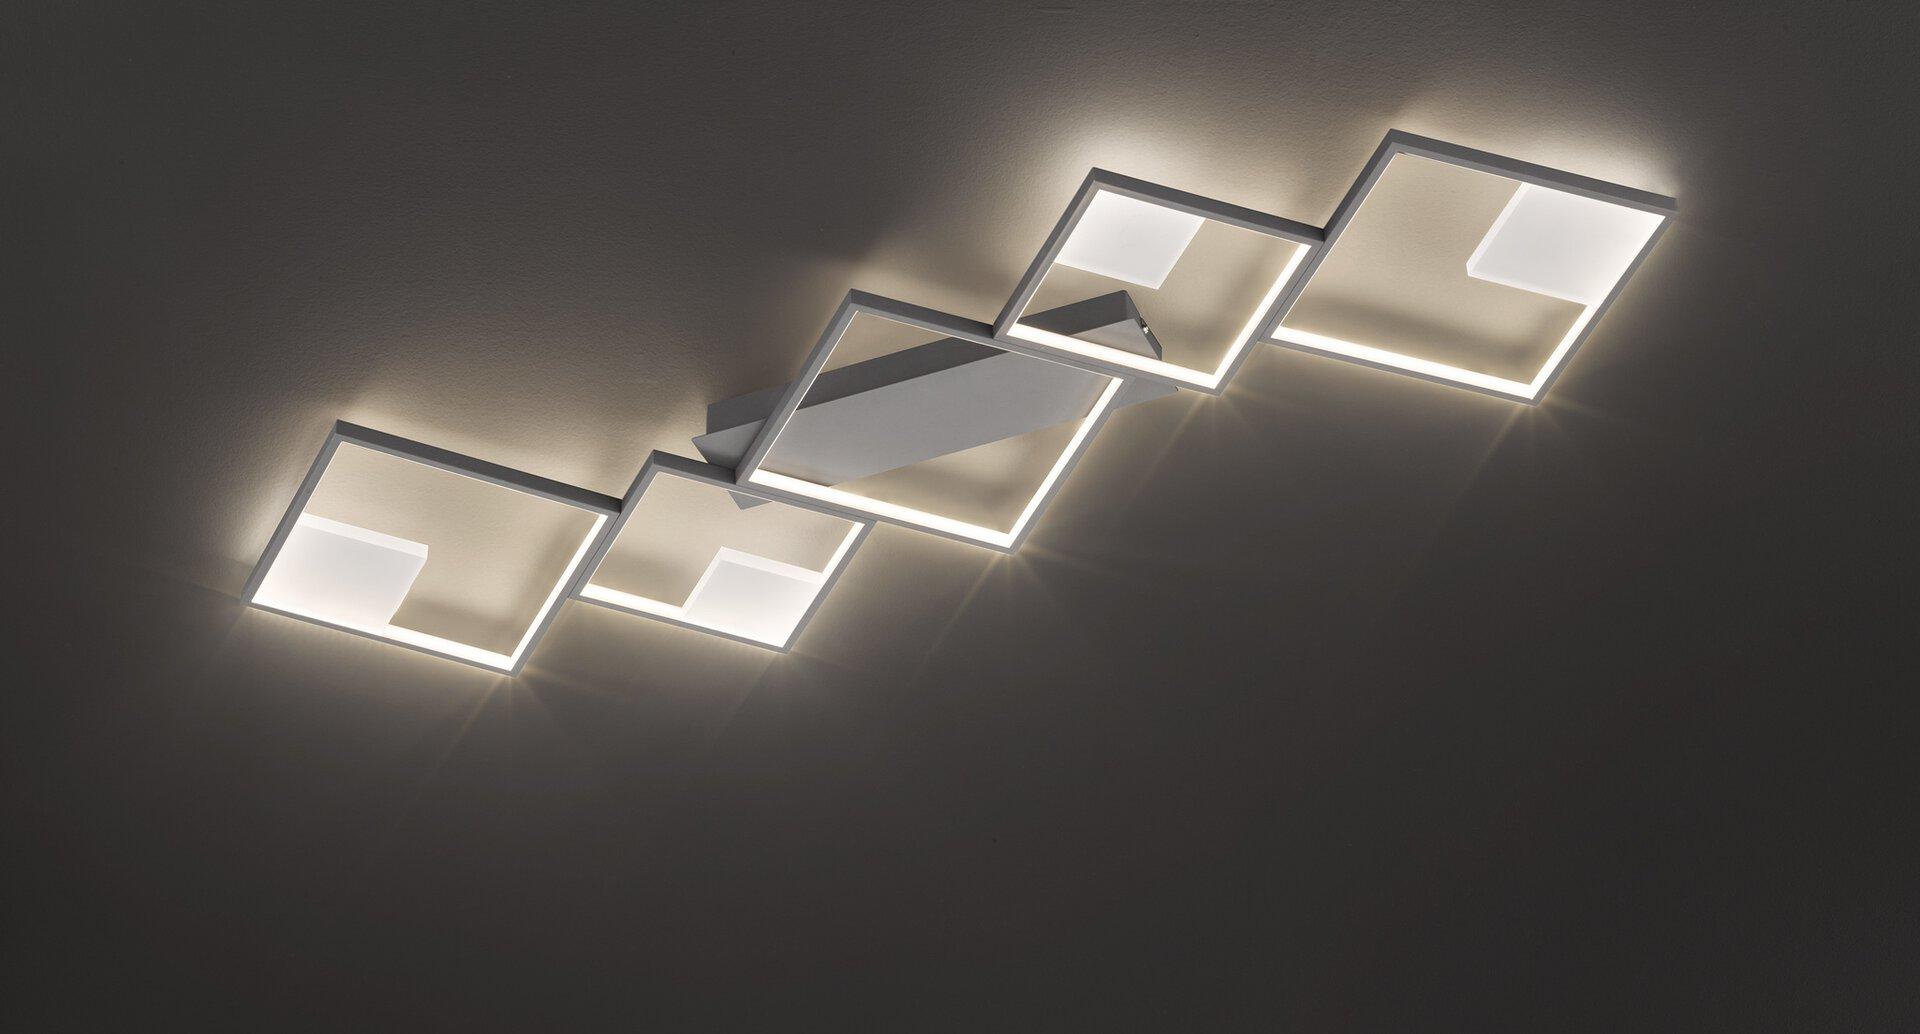 Deckenleuchte Jade Wofi Leuchten Metall grau 47 x 6 x 130 cm